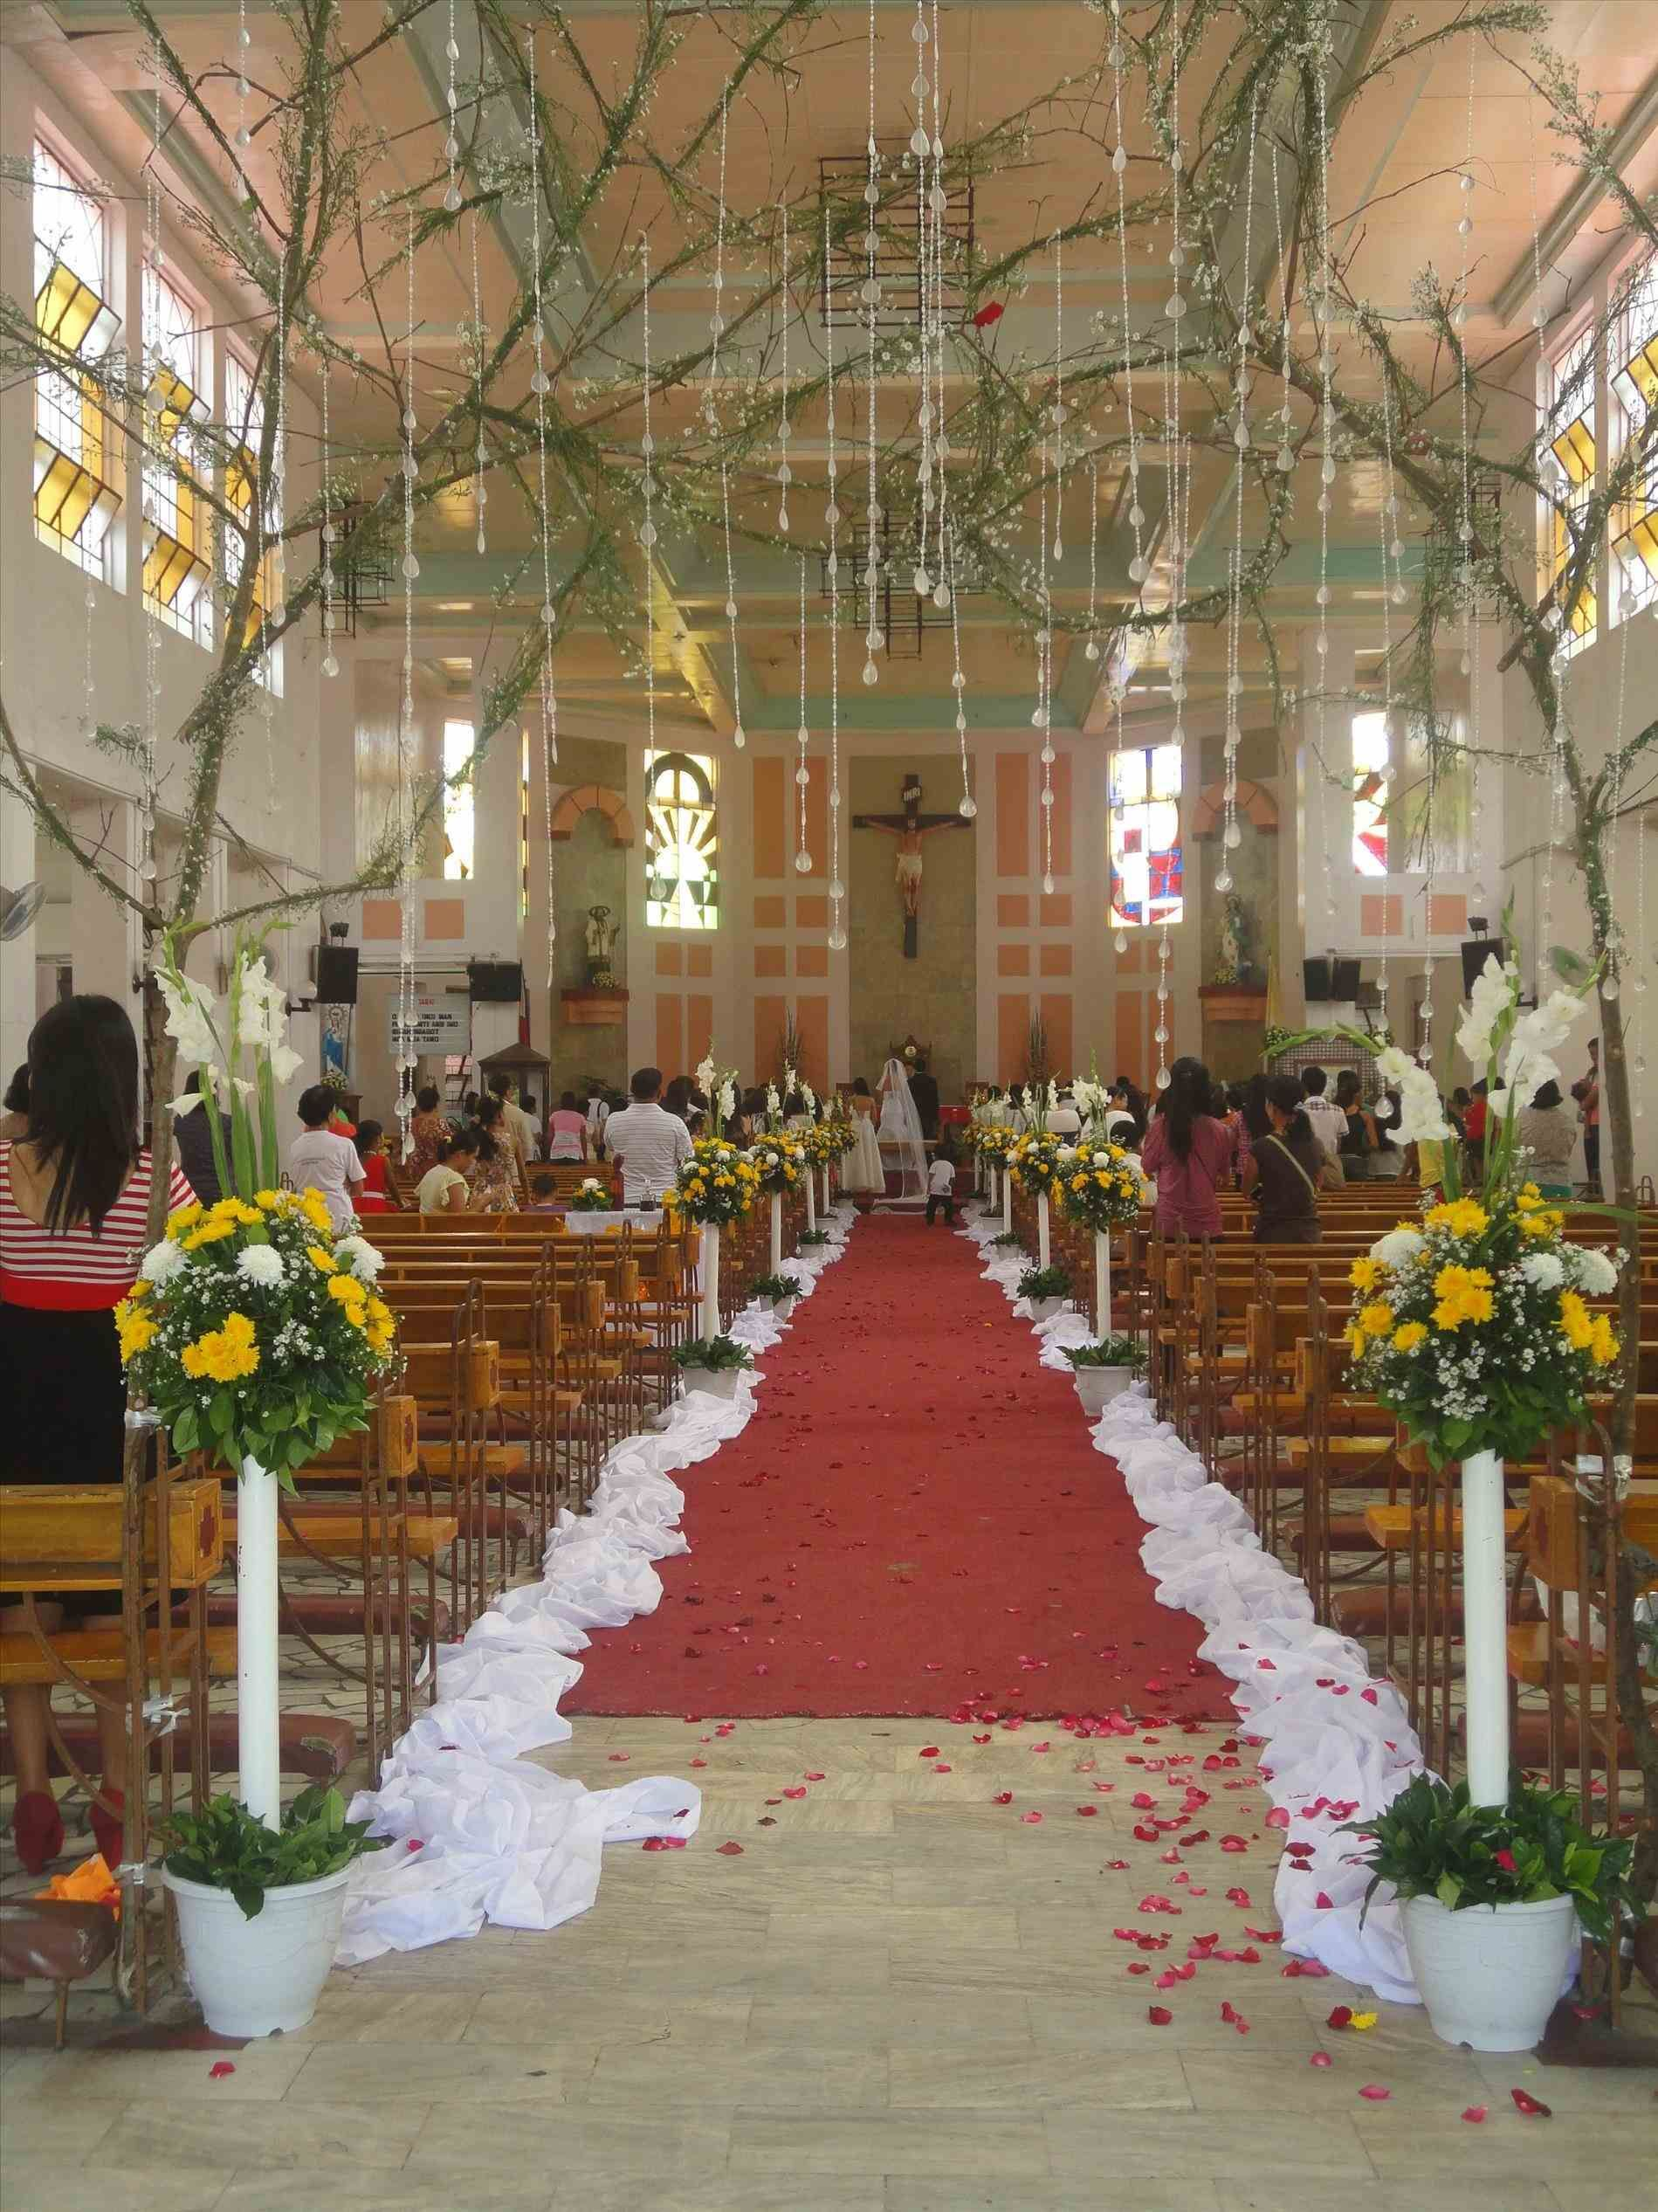 Church Altar Wedding Decorations Ideas For Decorating Catholic